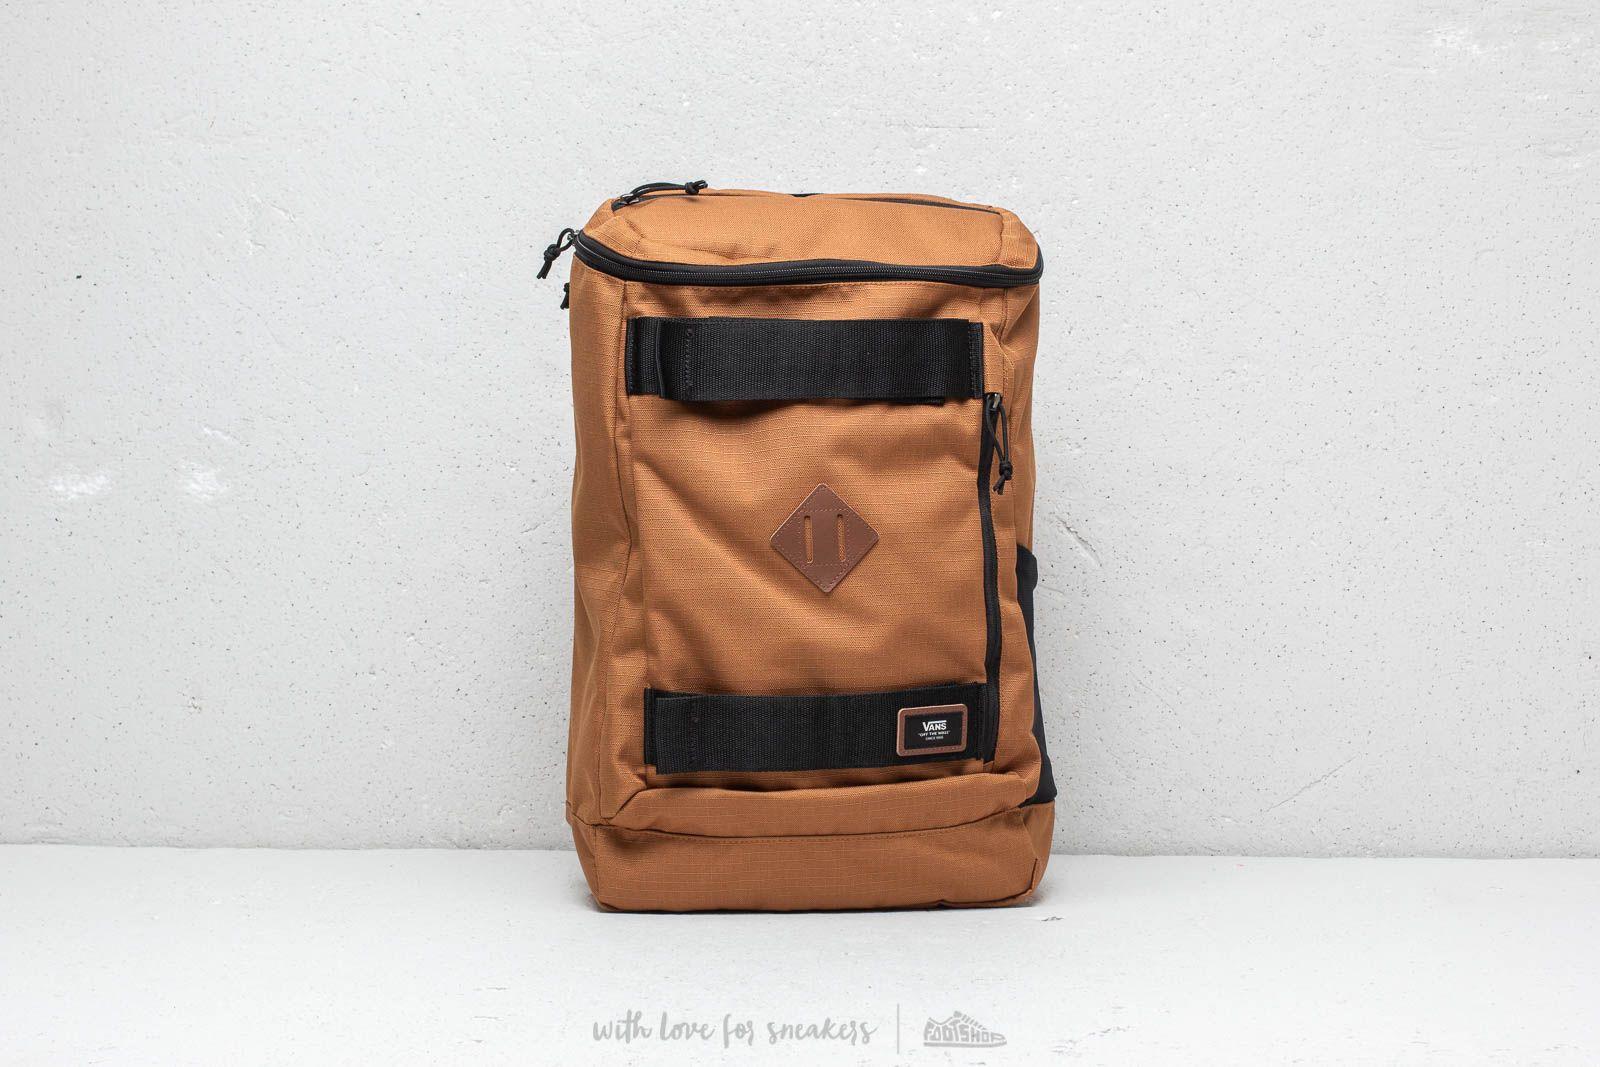 Vans Hooks Skatepack Rubber  8f3a57d3d8